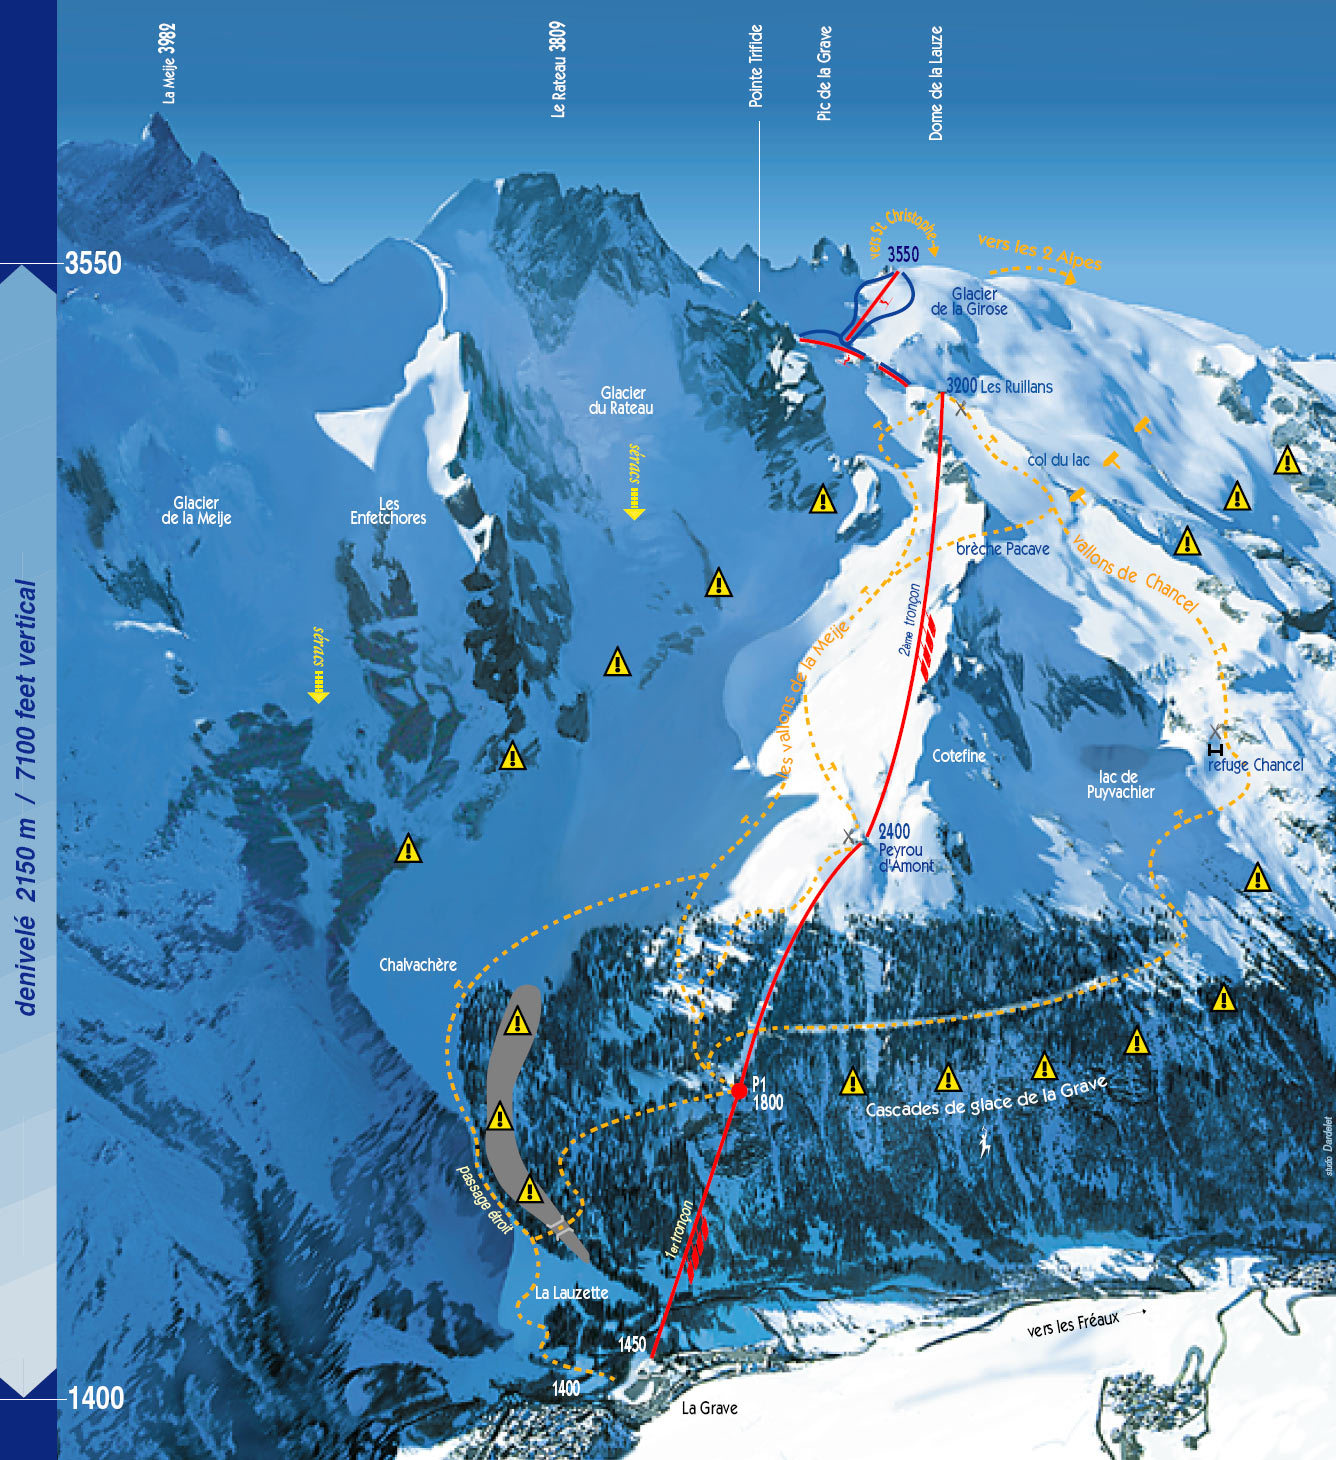 Ski map La grave